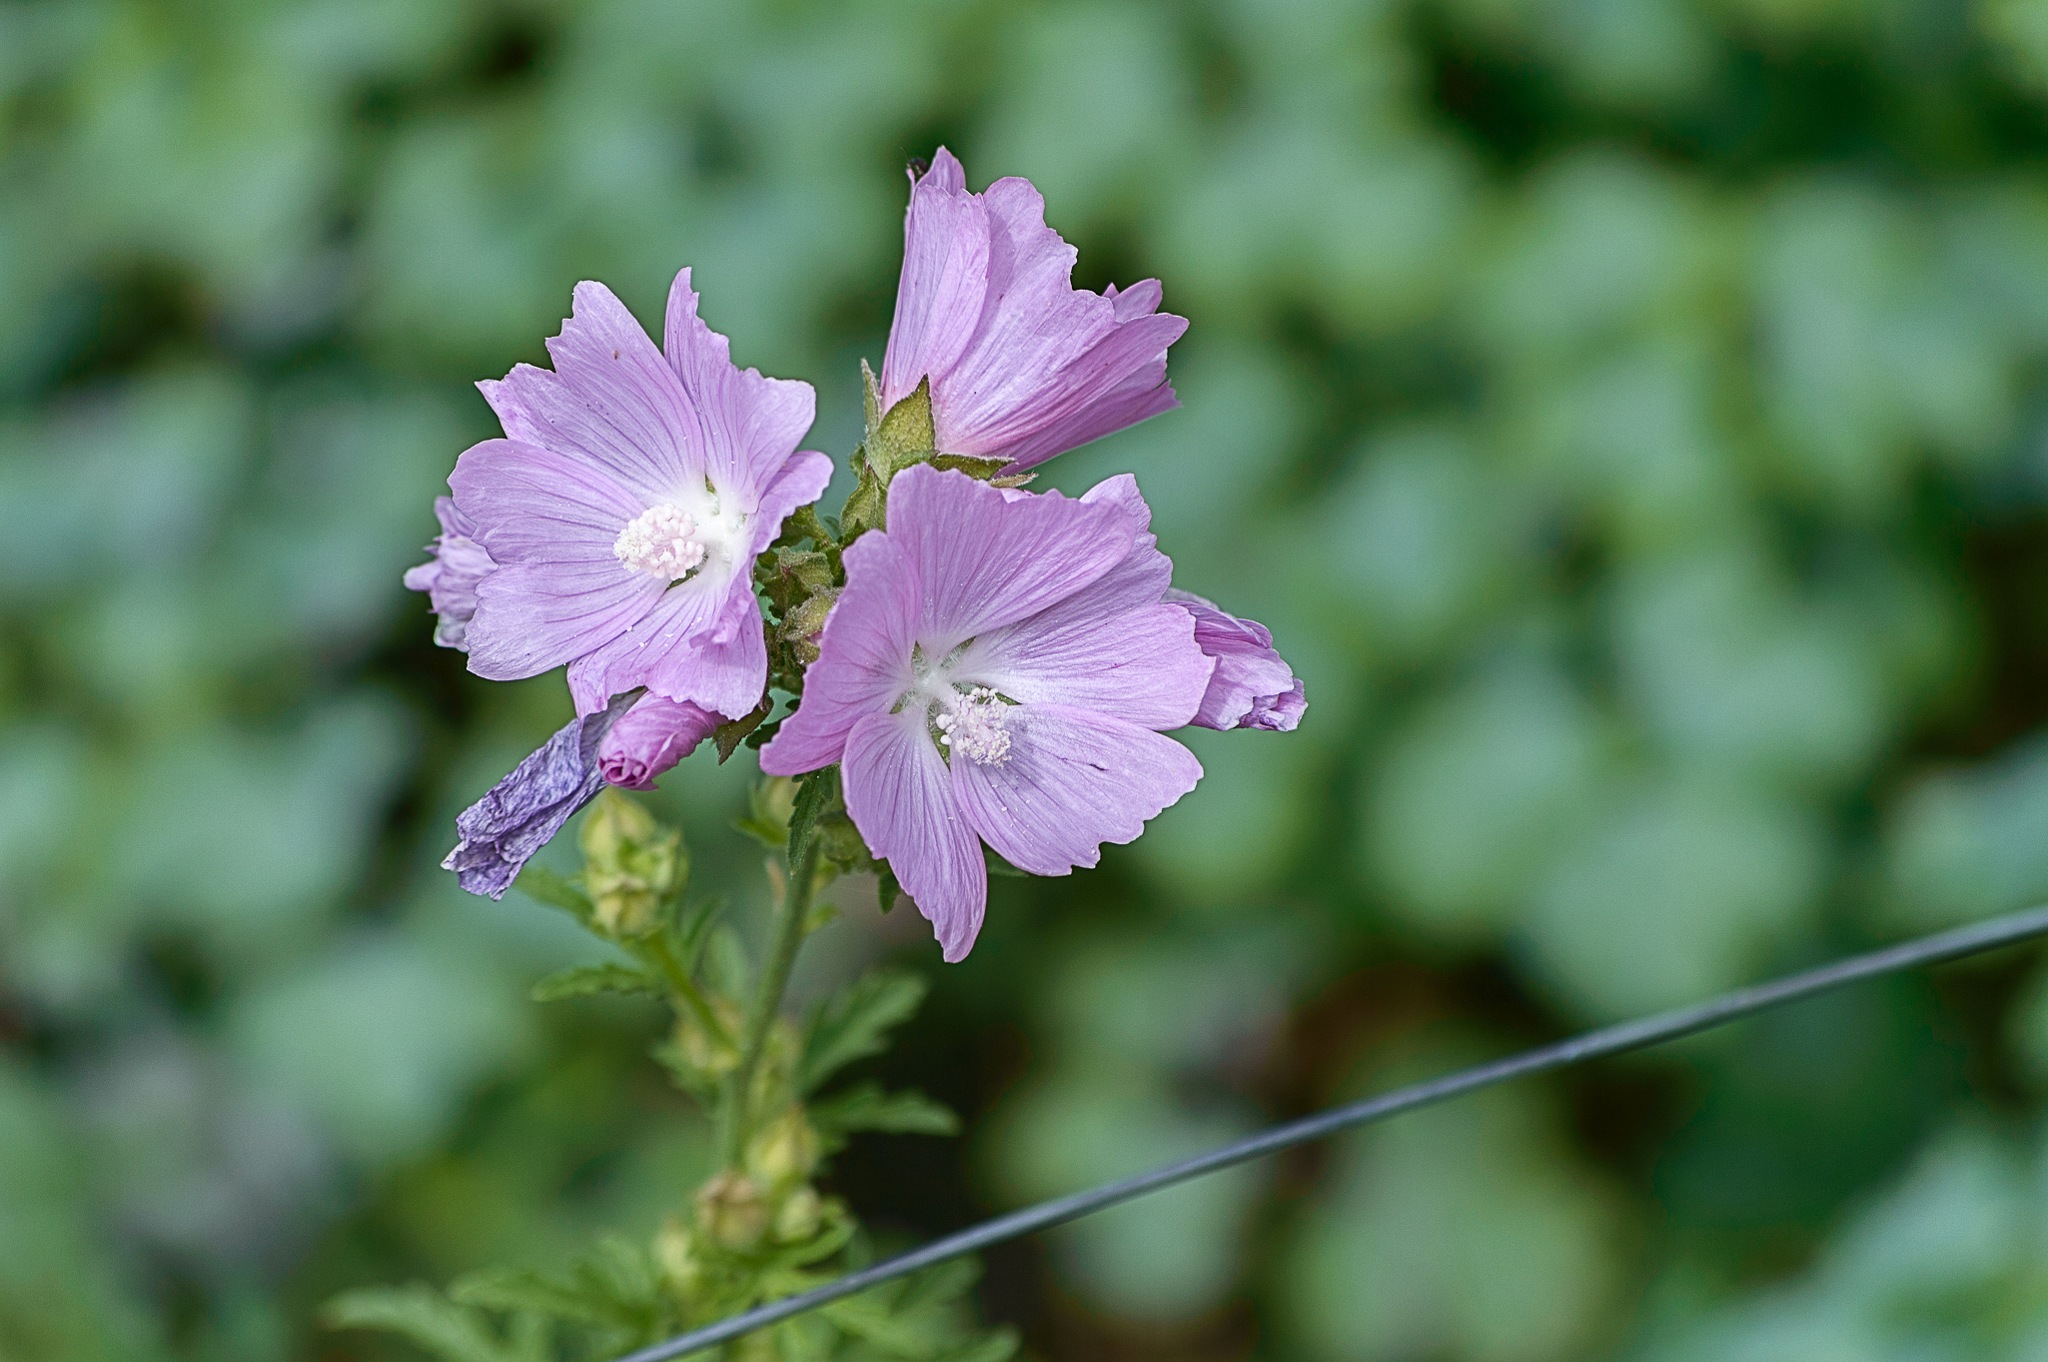 Purple flower by Micke Seise